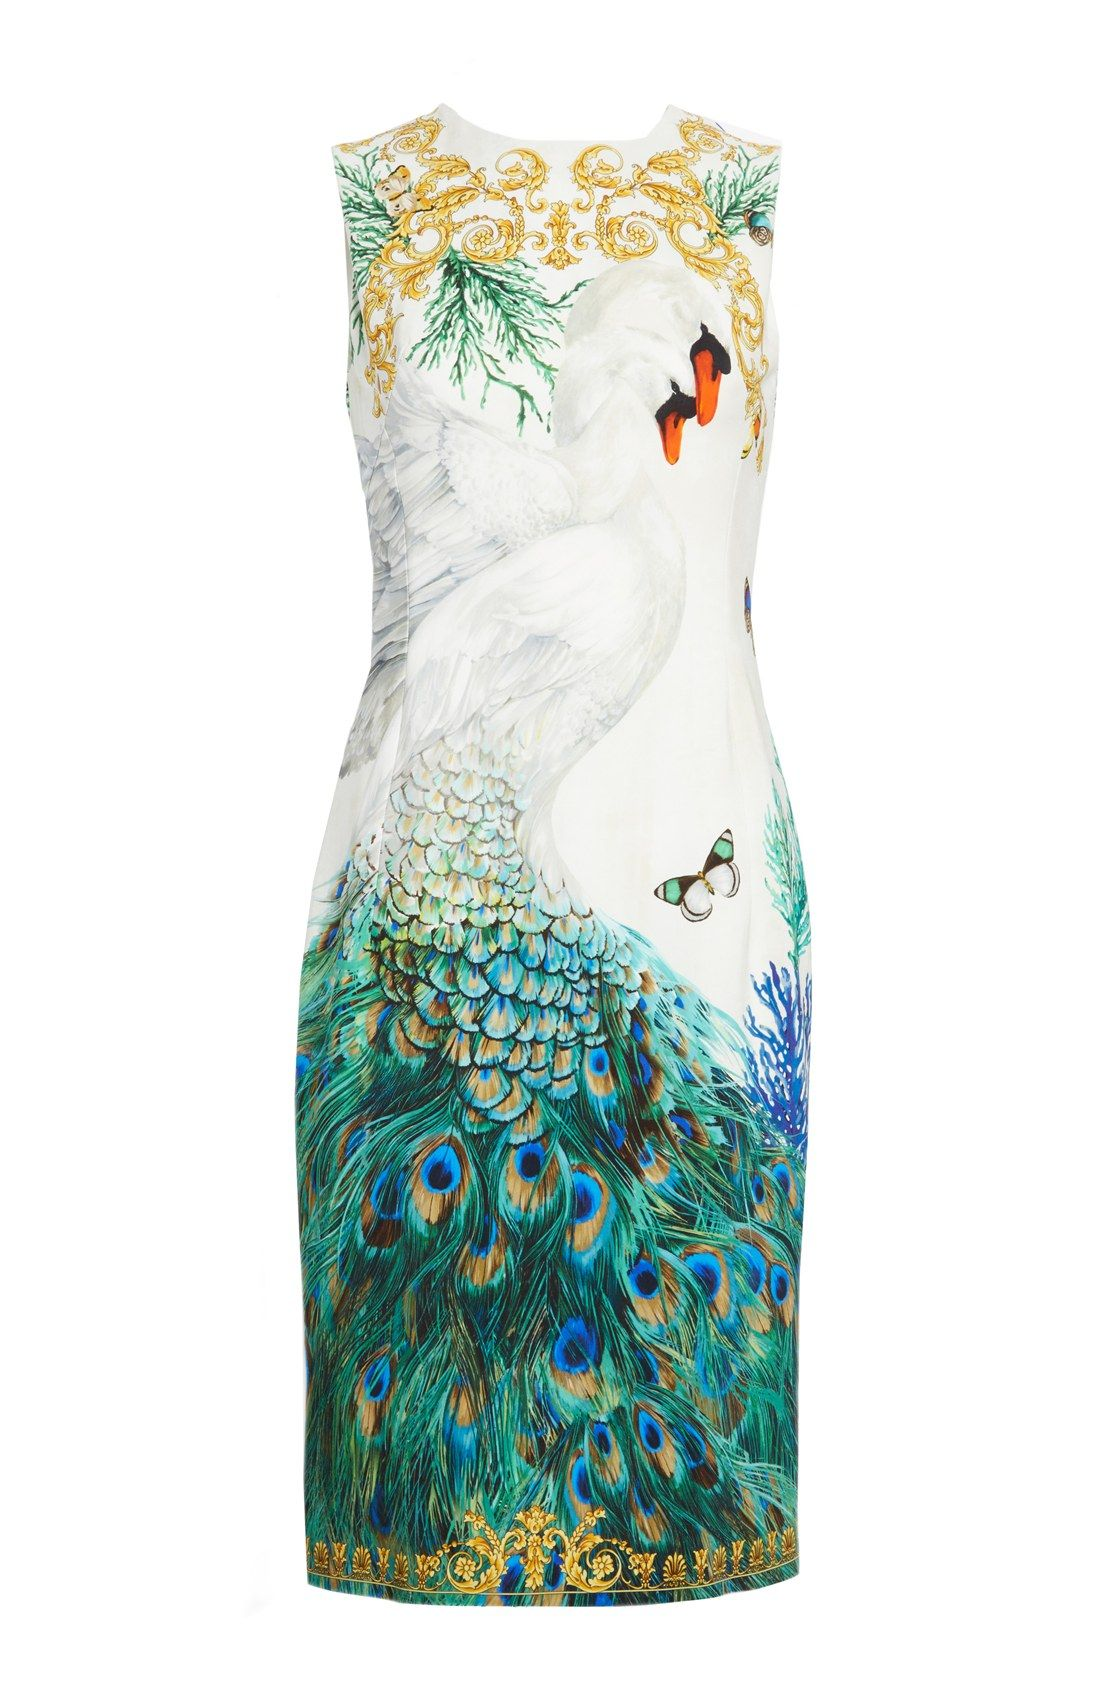 051e6718e047 Versace Collection Placed Swan Print Sheath Dress